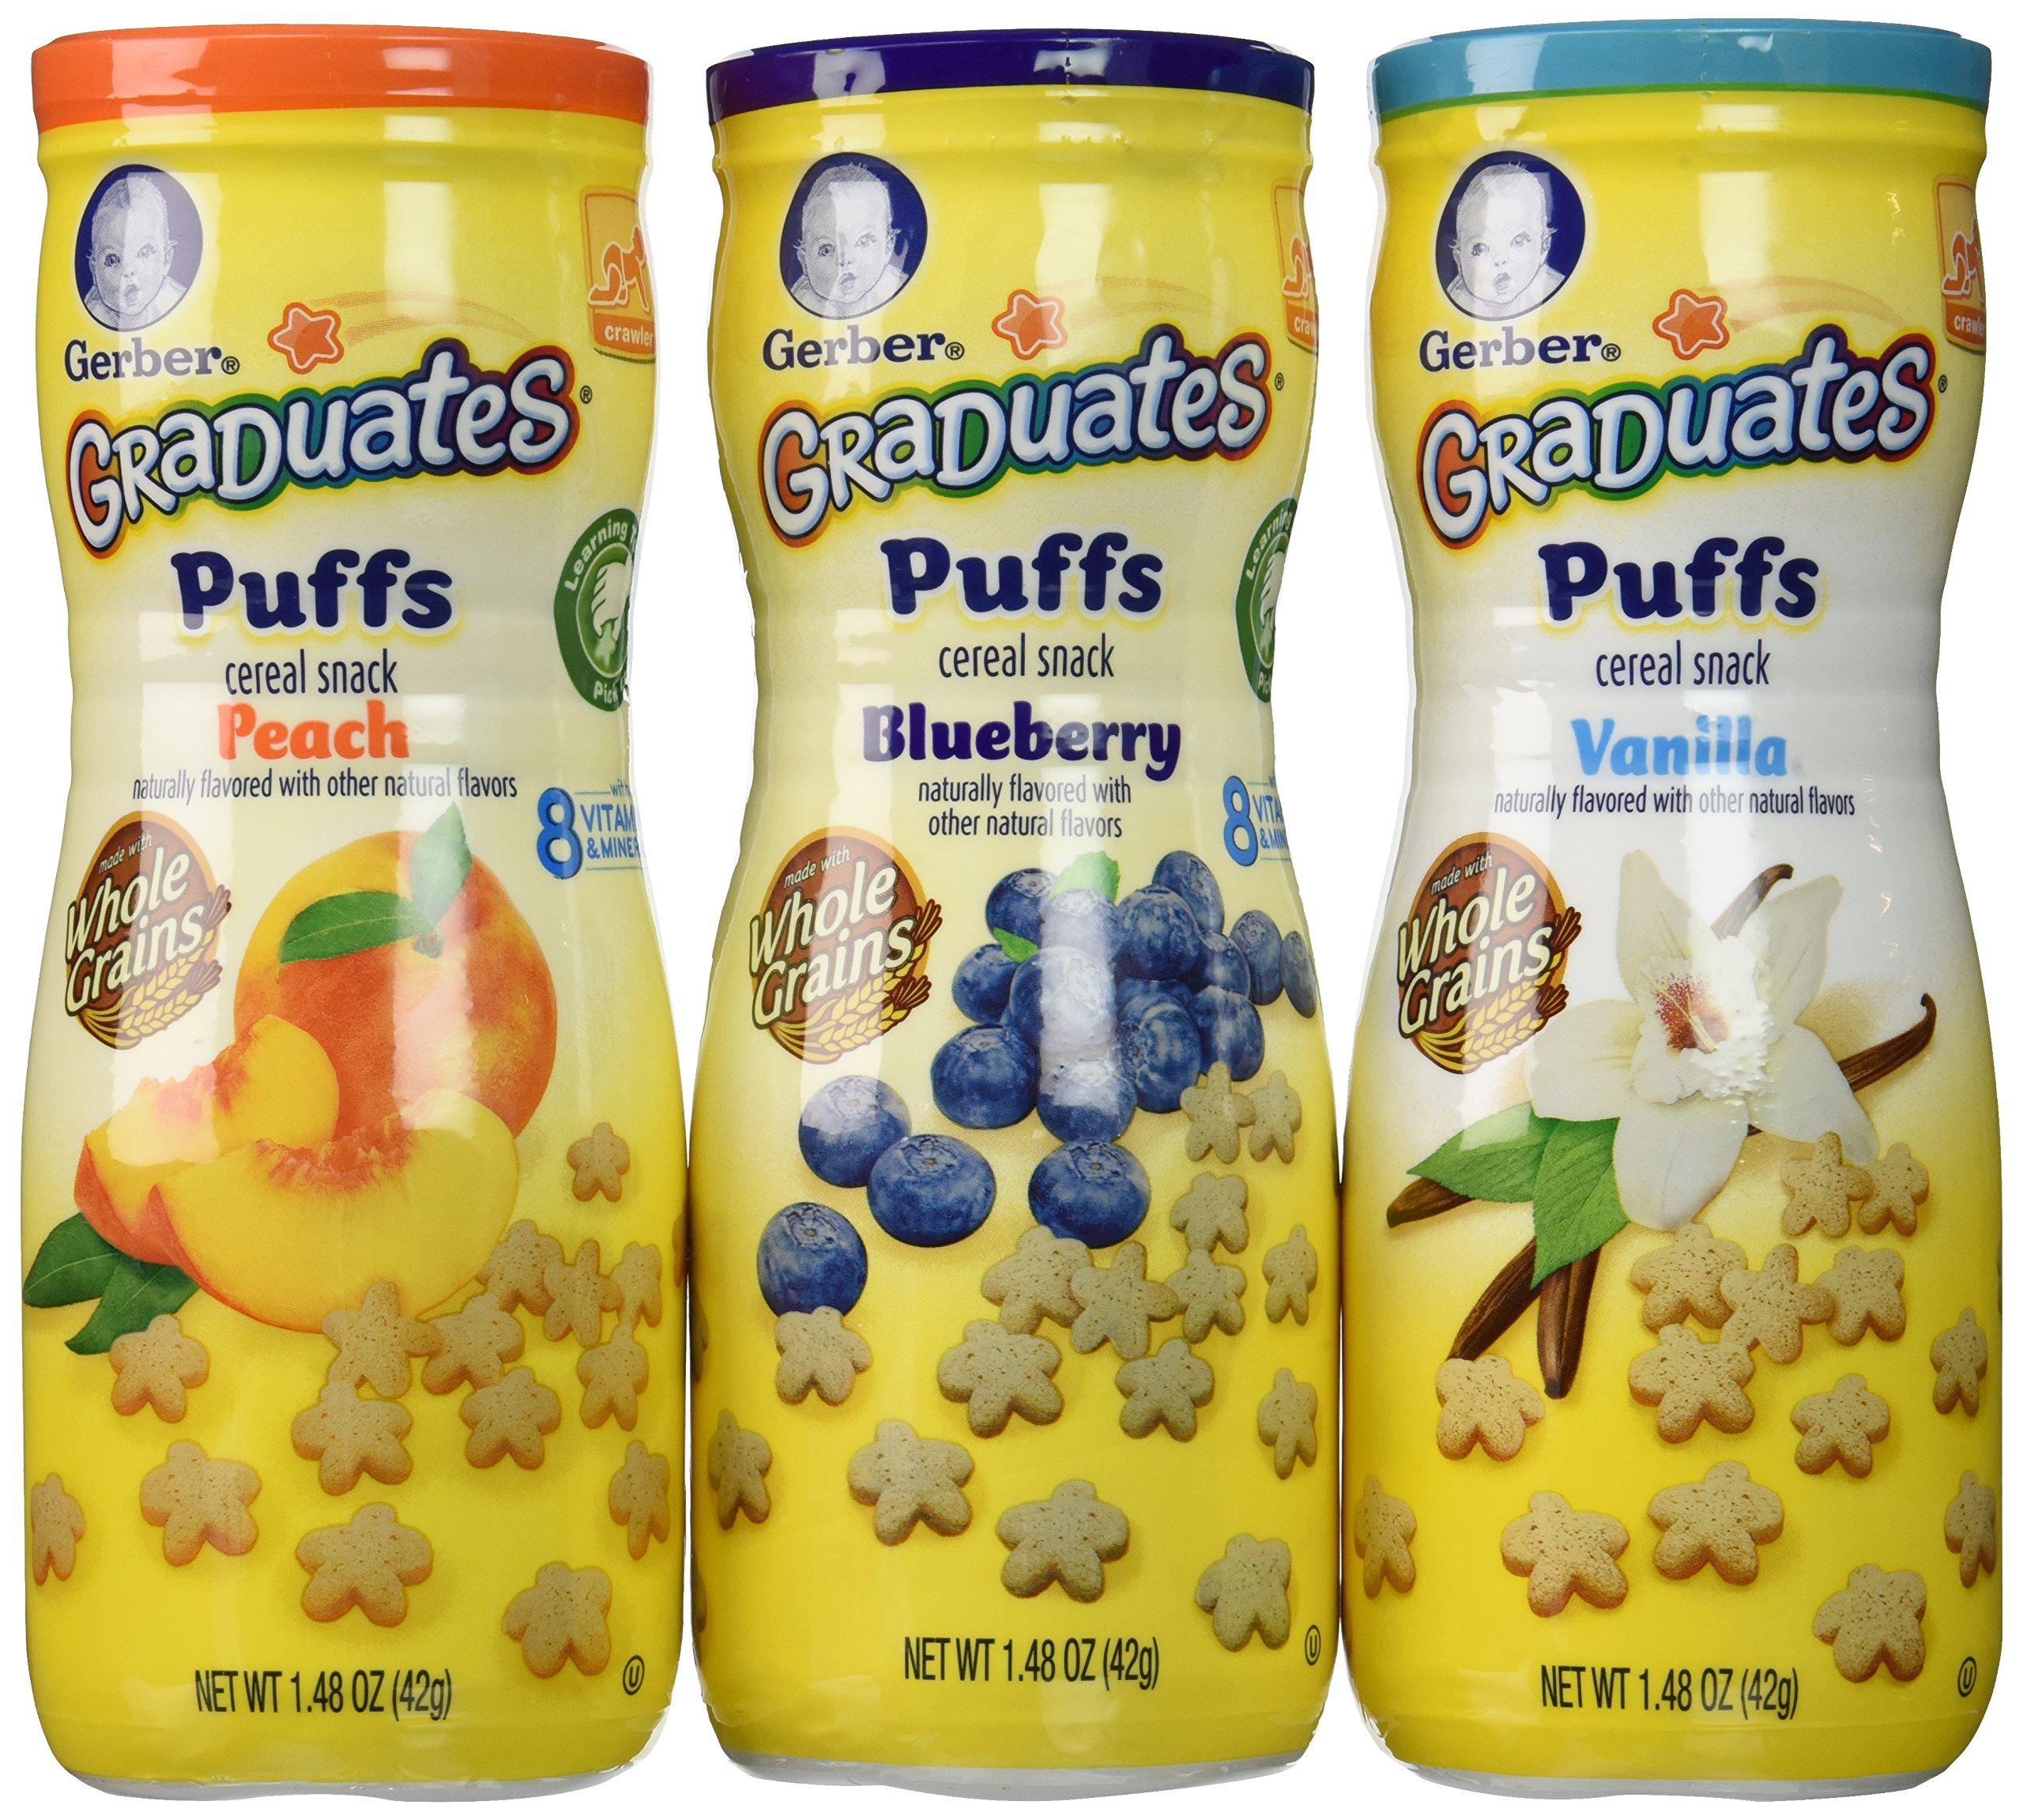 Gerber Graduates Puffs - Variety Pack (Peach, Vanilla, Blueberry) - 1.48 oz - 3 Pack